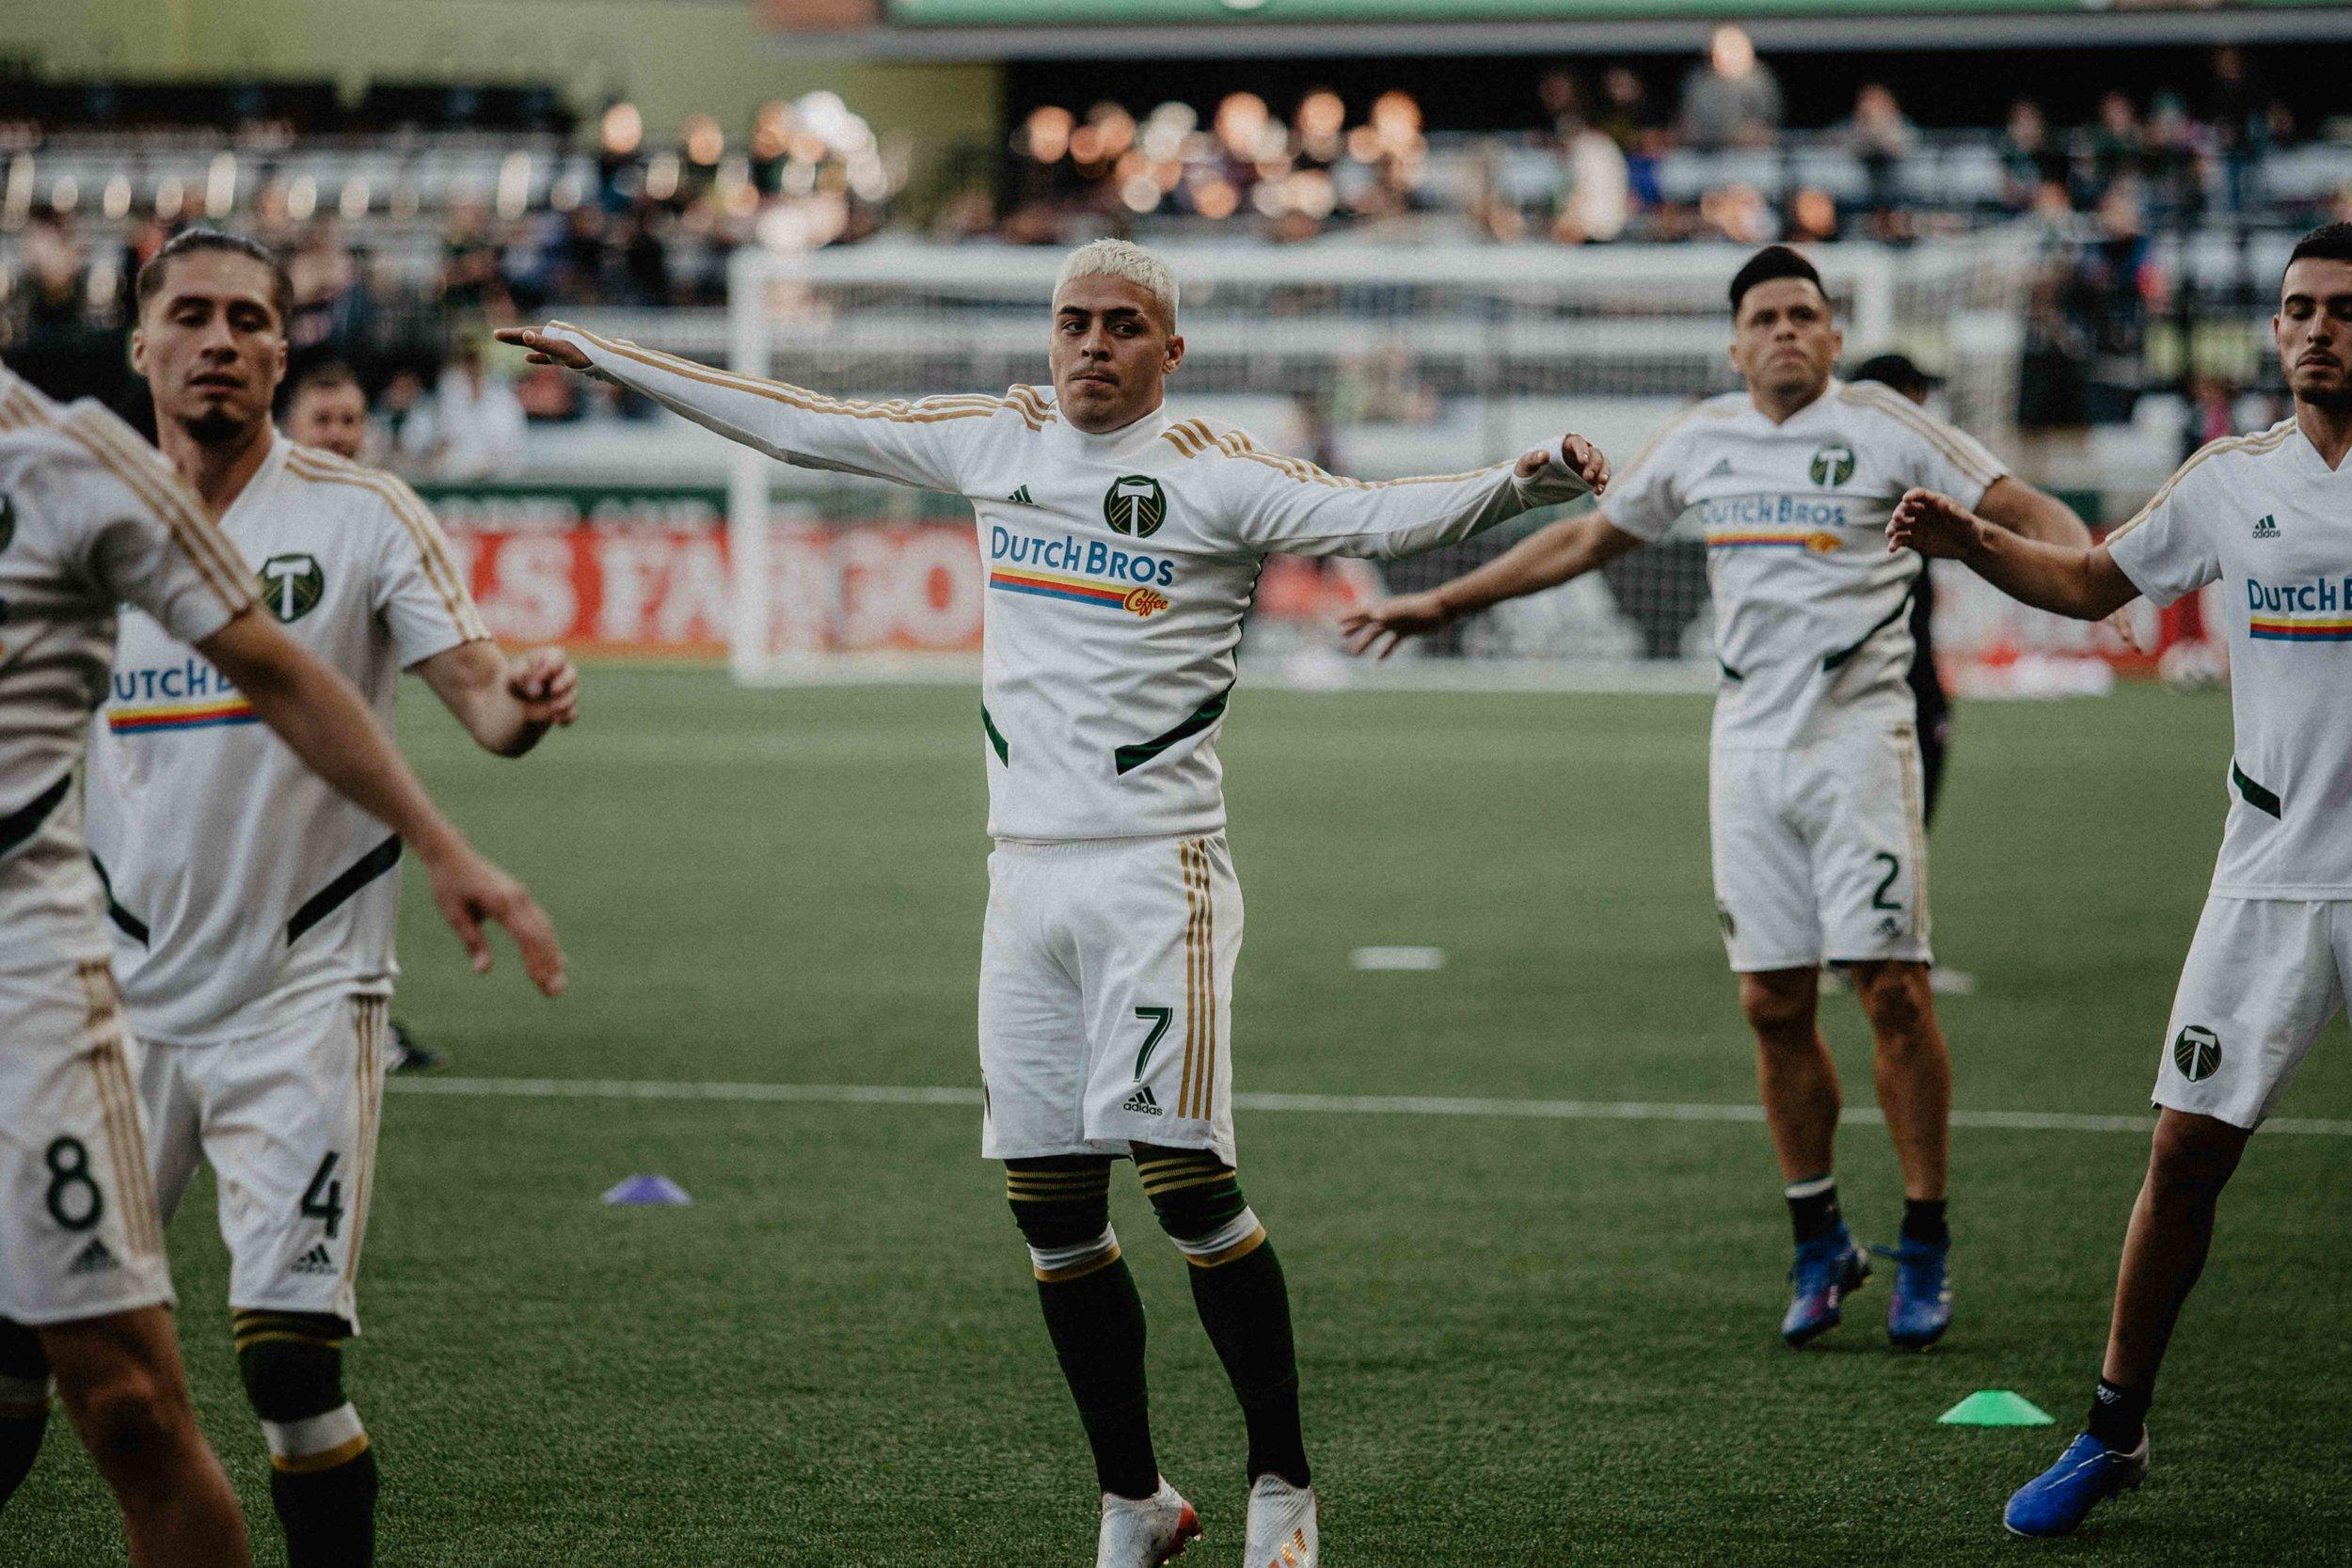 PortlandTimbers_FCDallas_Soccer012.JPG